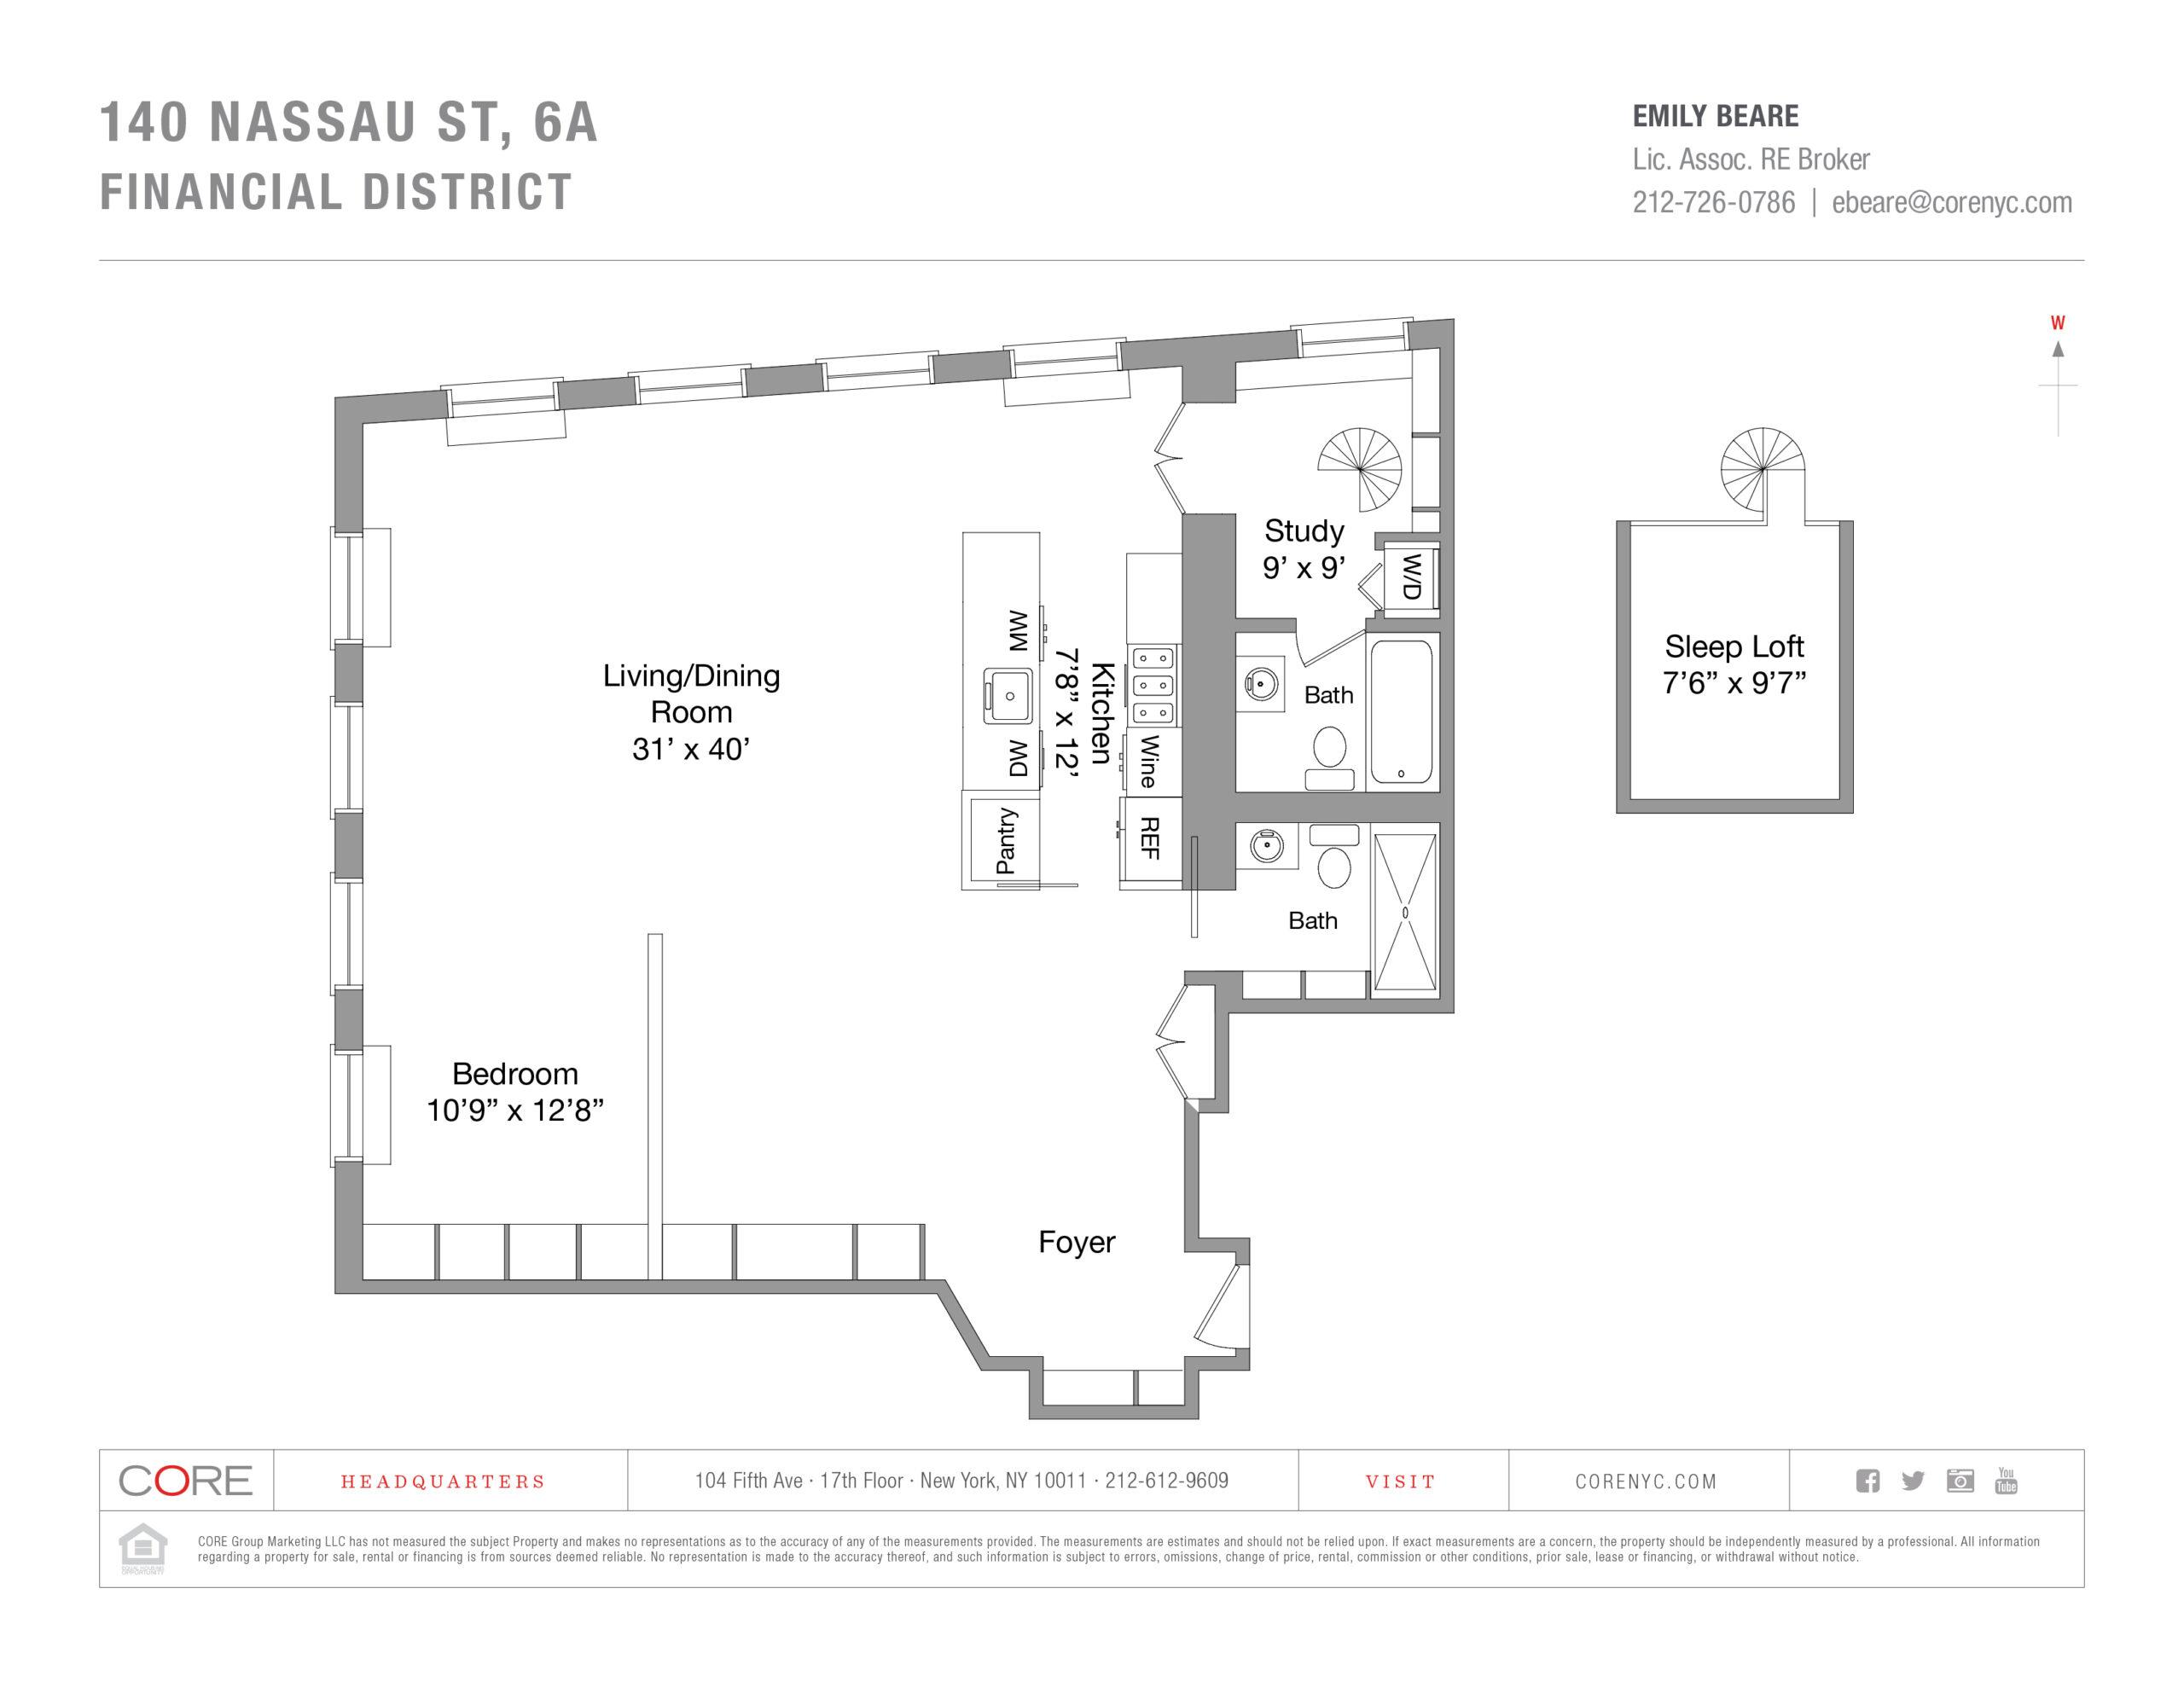 140 Nassau St. 6A, New York, NY 10038